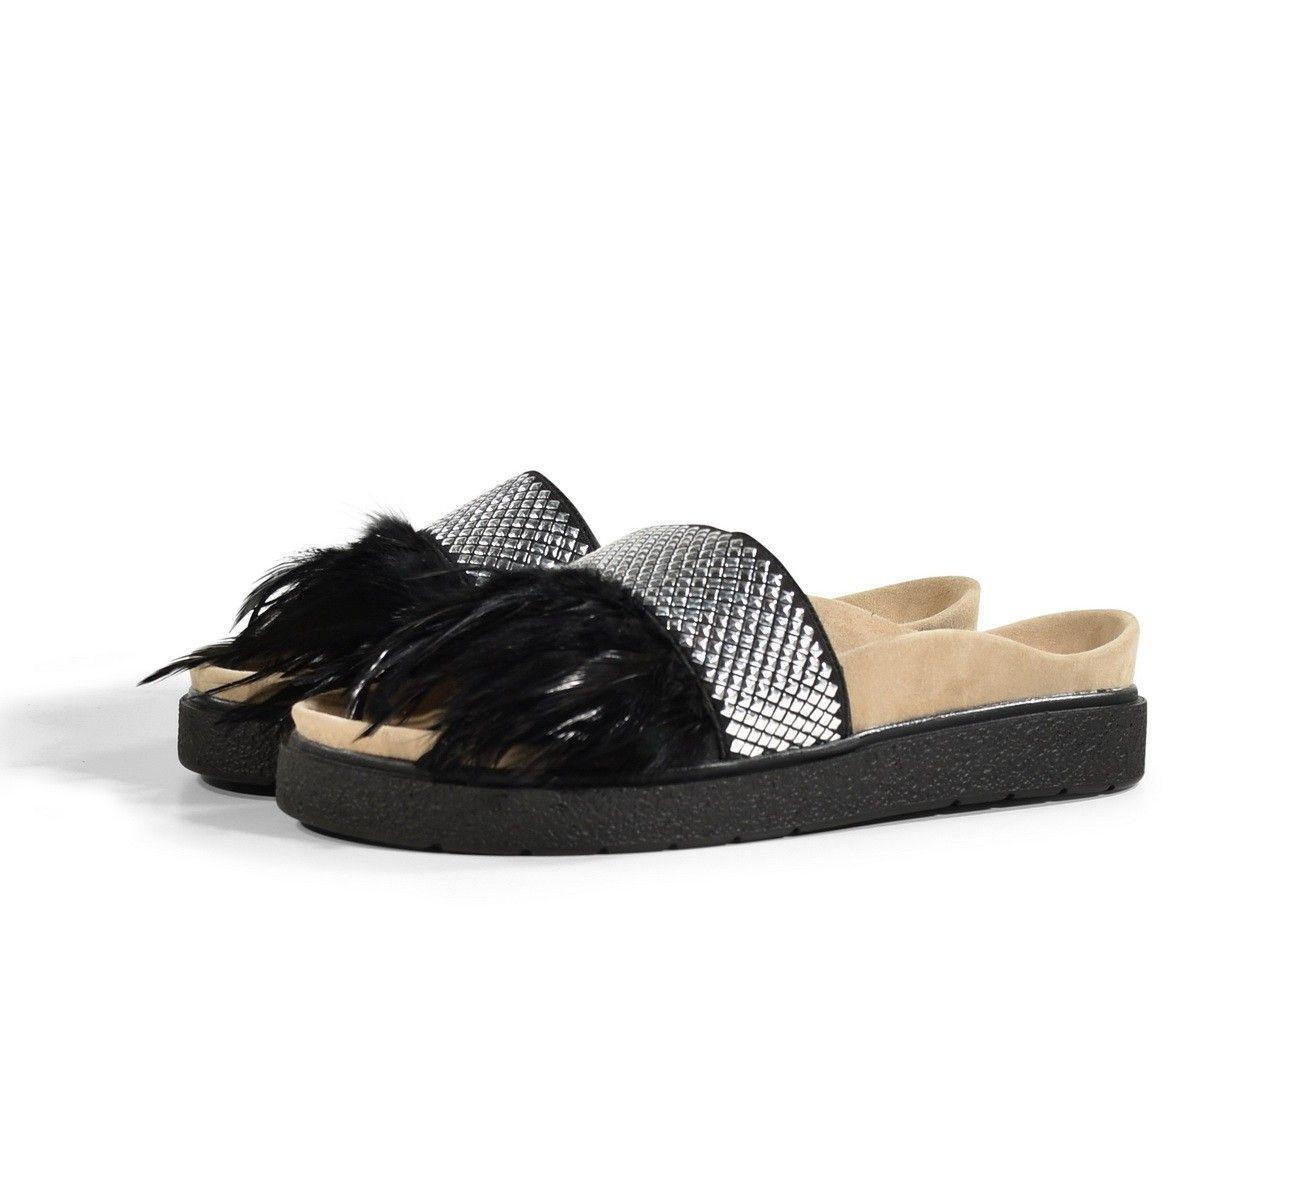 INUIKII - Damen Pantolette - Sandal - Feathers Black